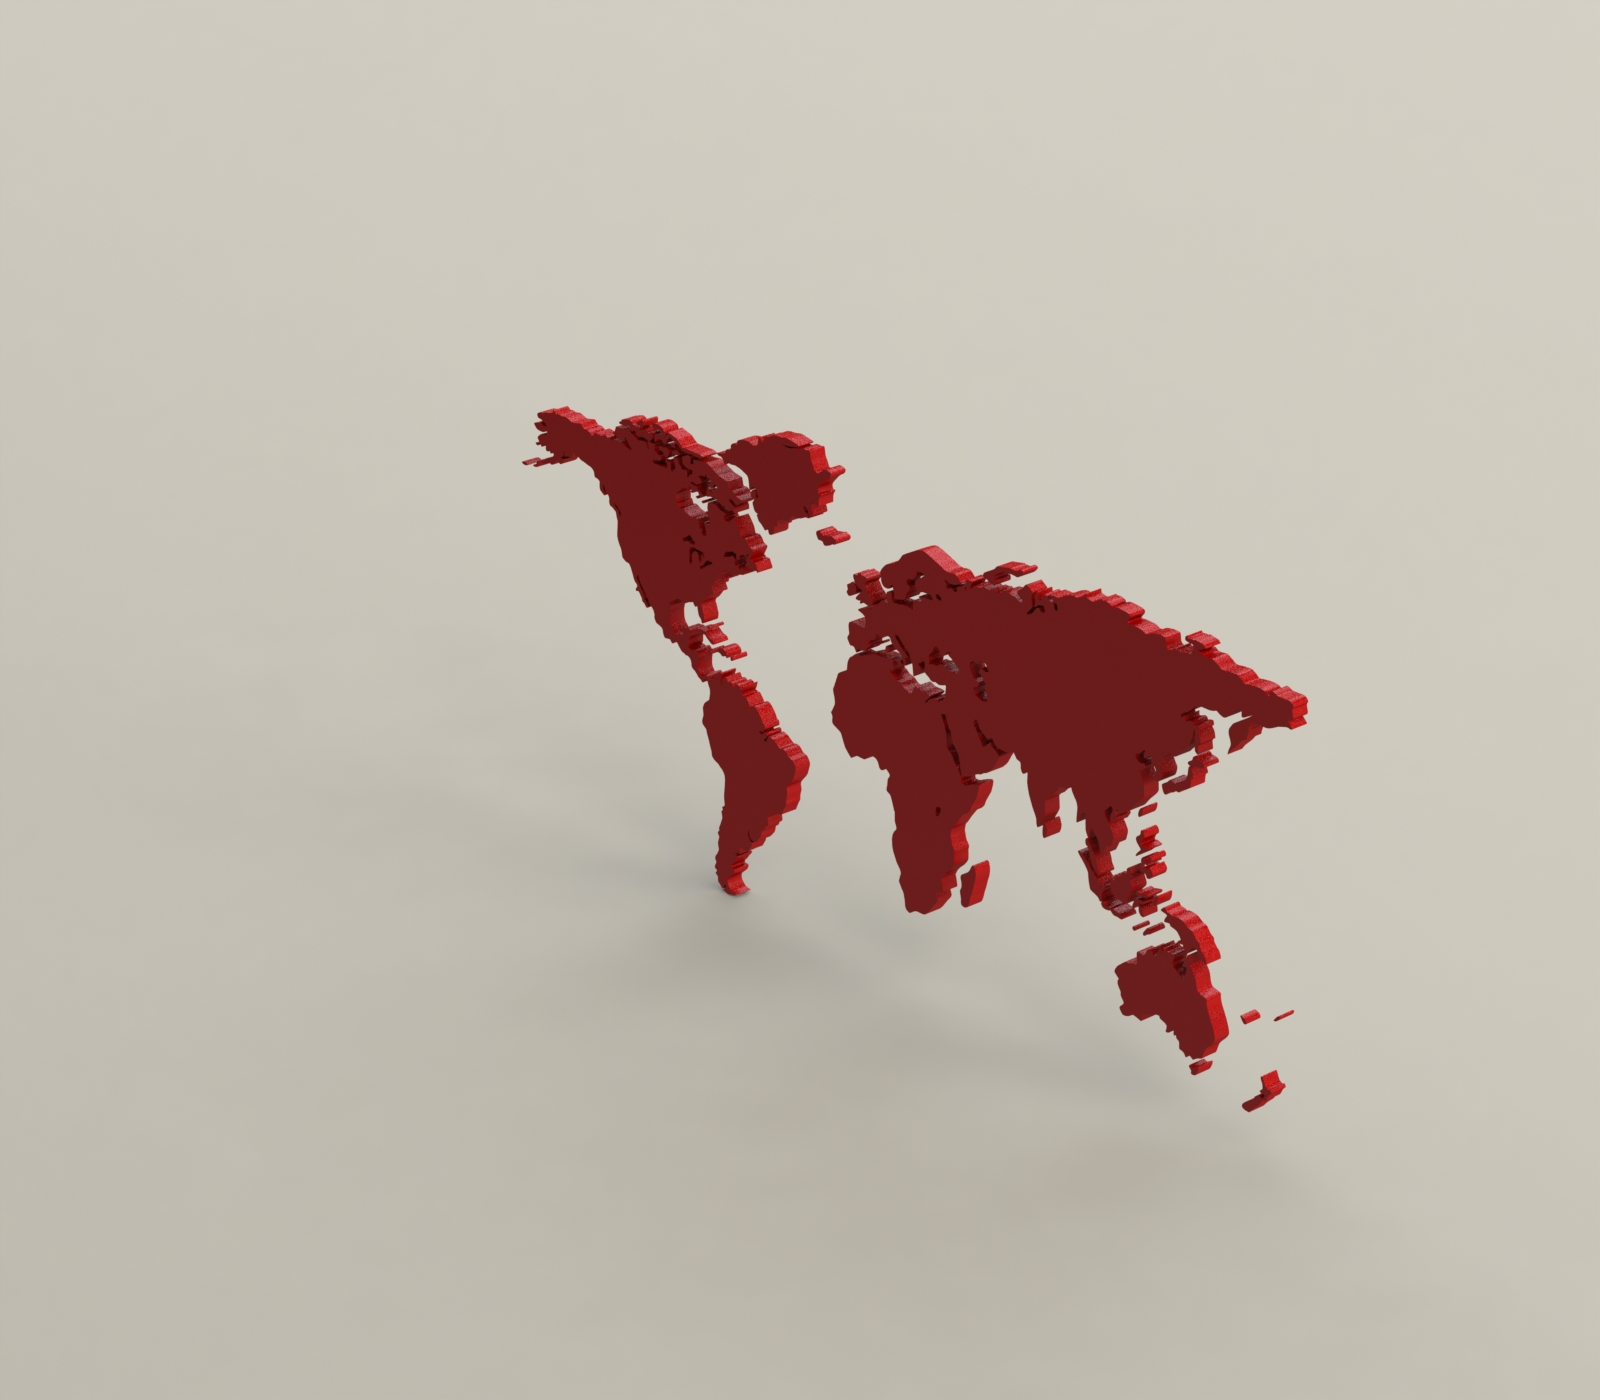 2.JPG Download free STL file World map • 3D print template, osayomipeters